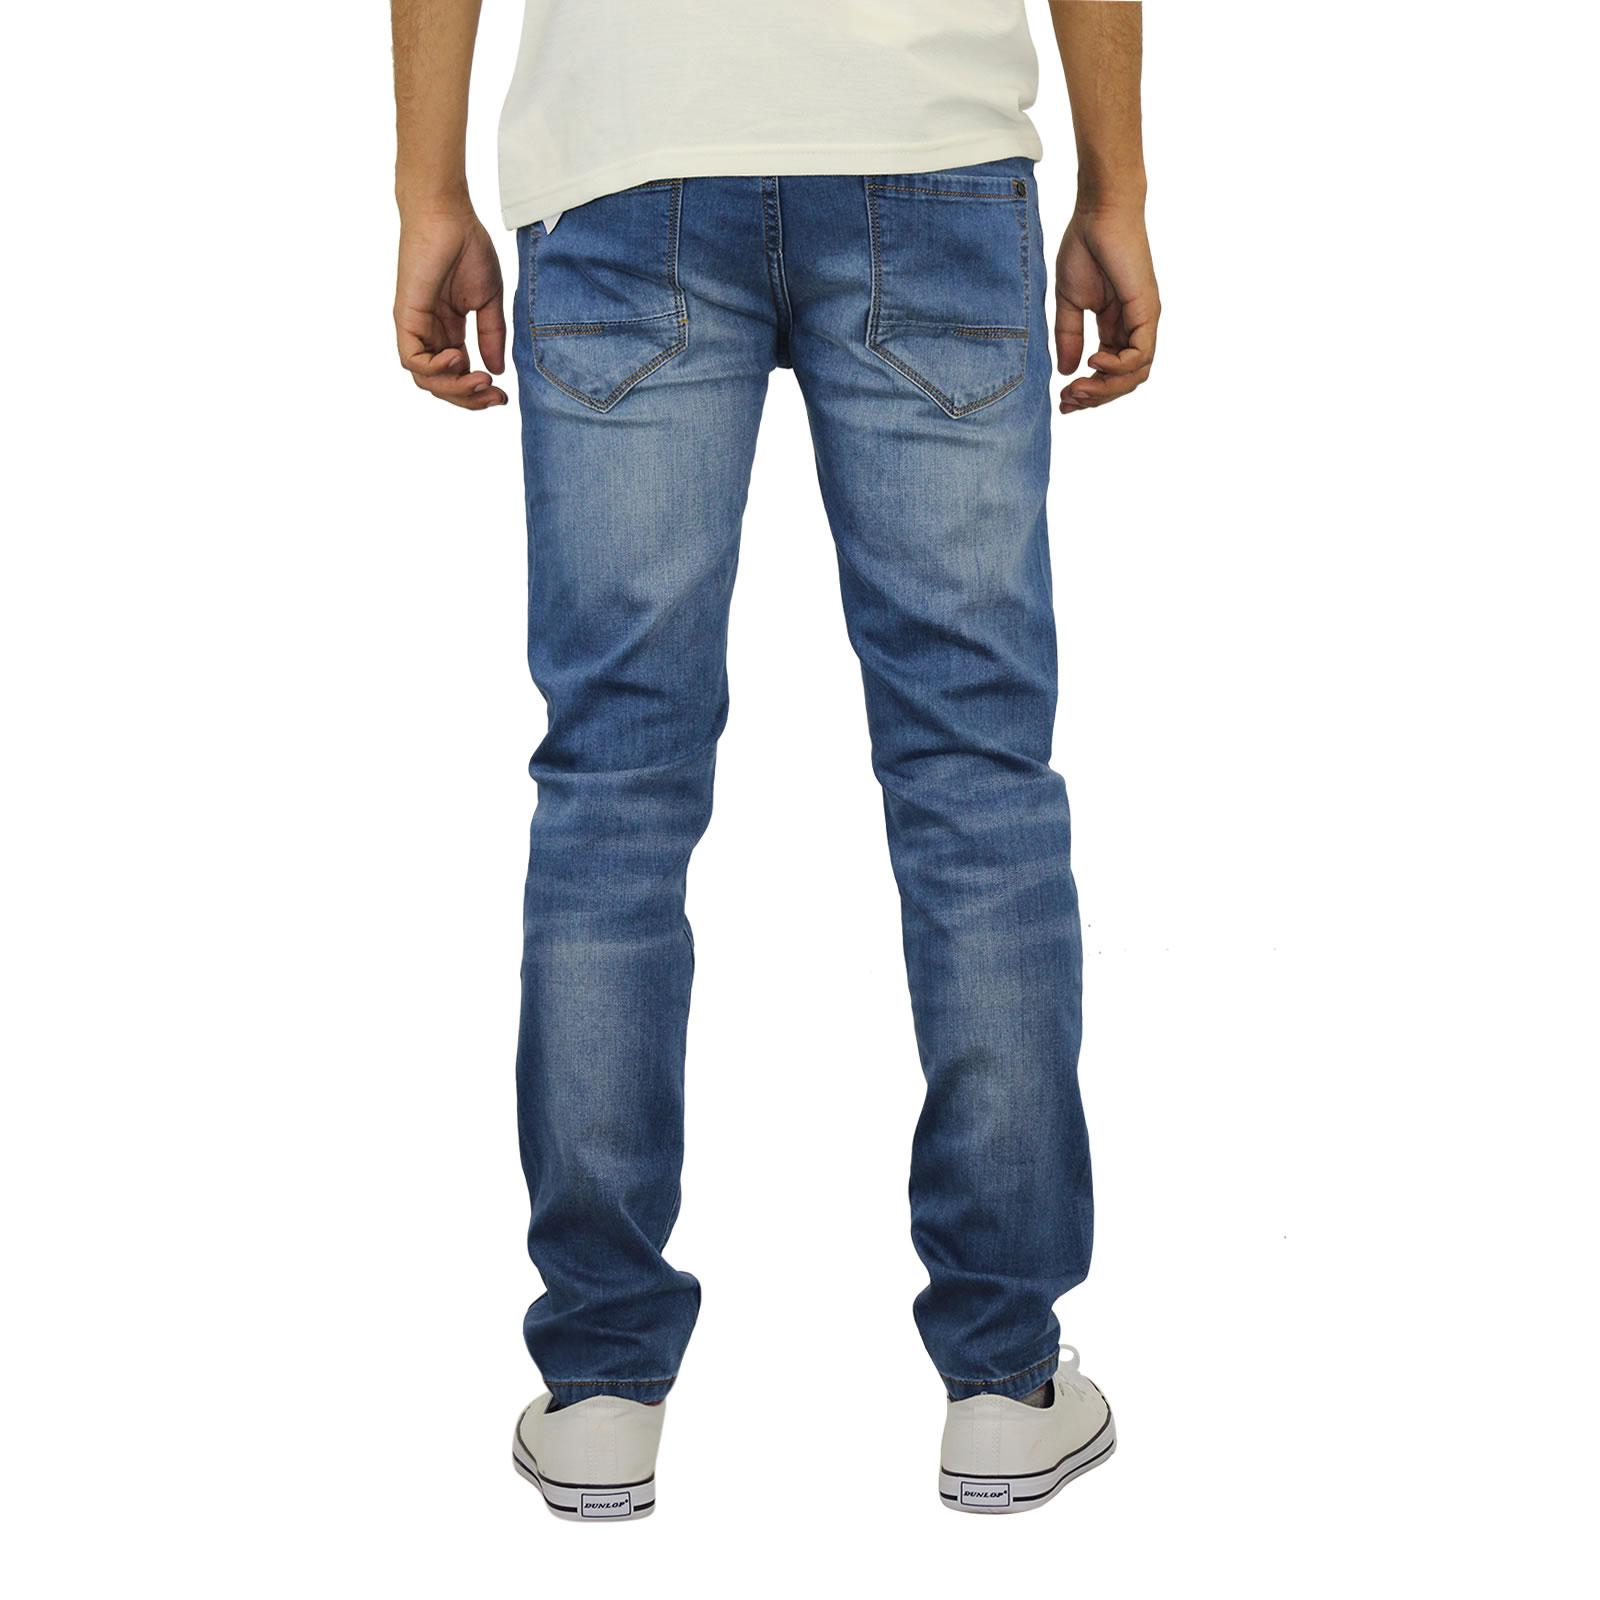 Jeans da Uomo Crosshatch emaciato Skinny Gamba Morbido Stretch Denim Pantaloni